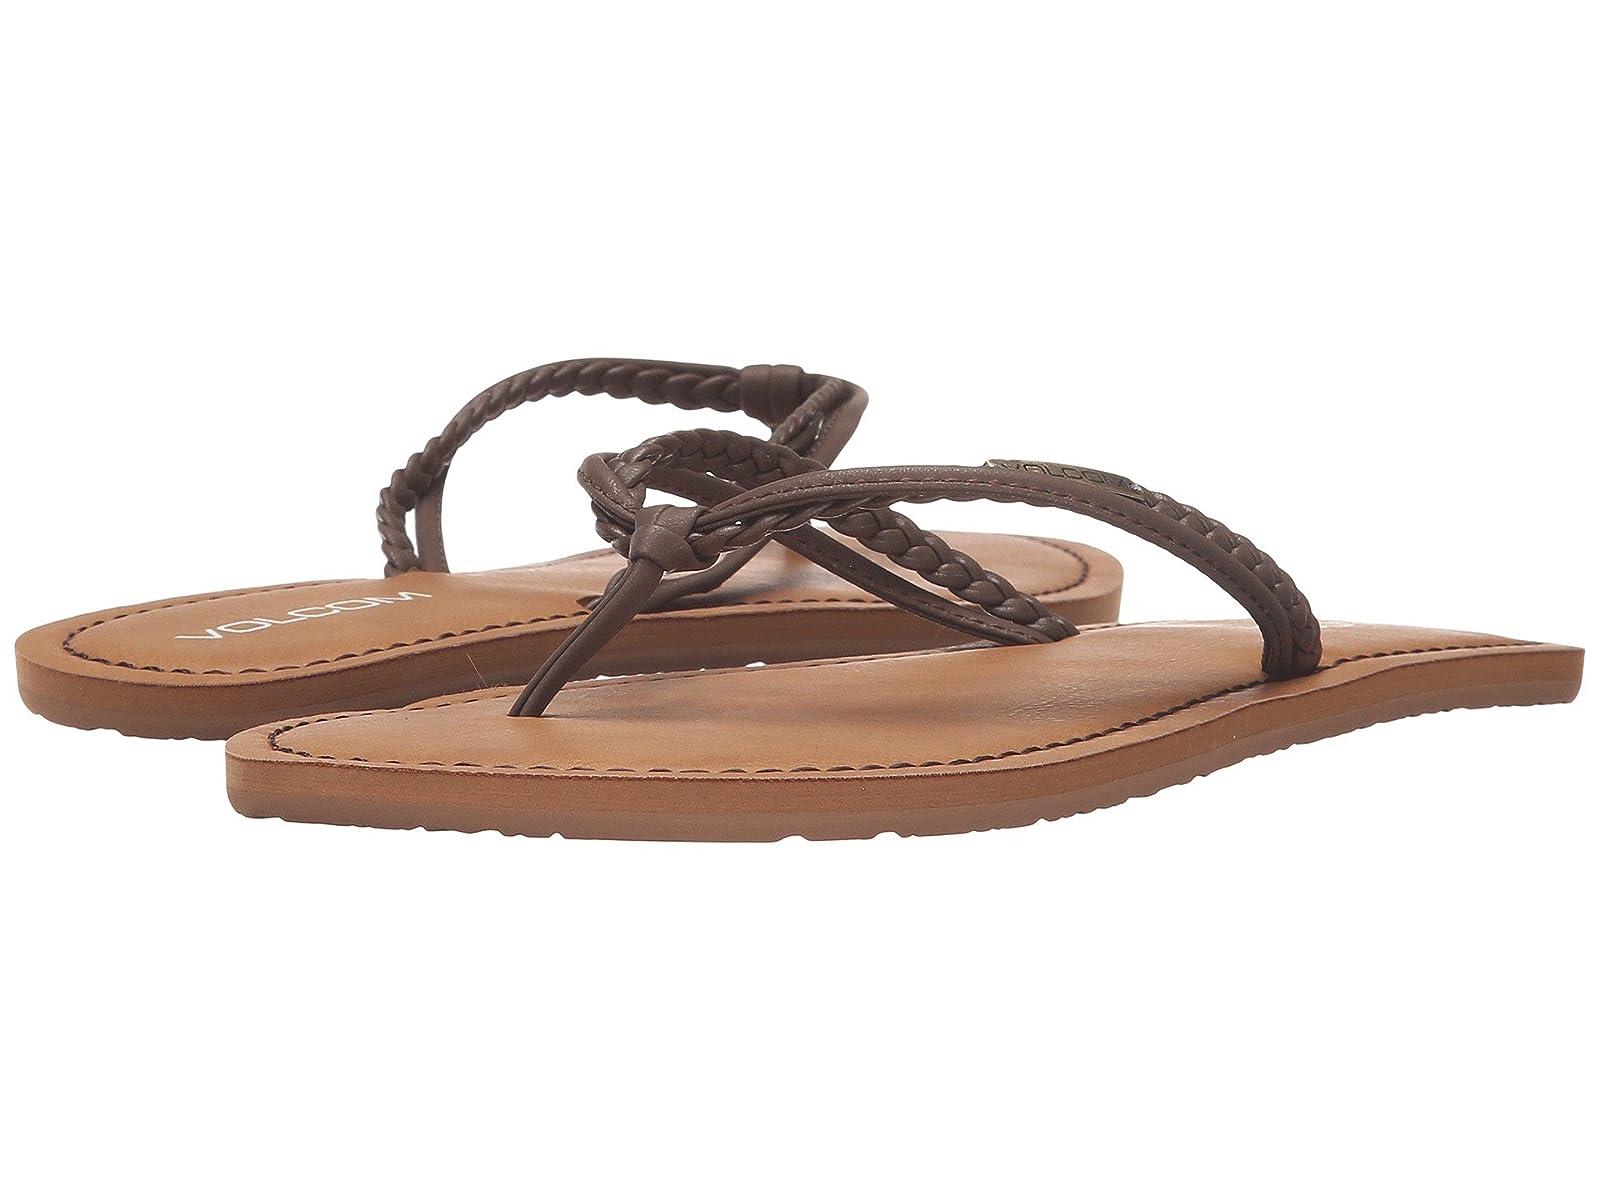 Volcom Tour SandalAtmospheric grades have affordable shoes